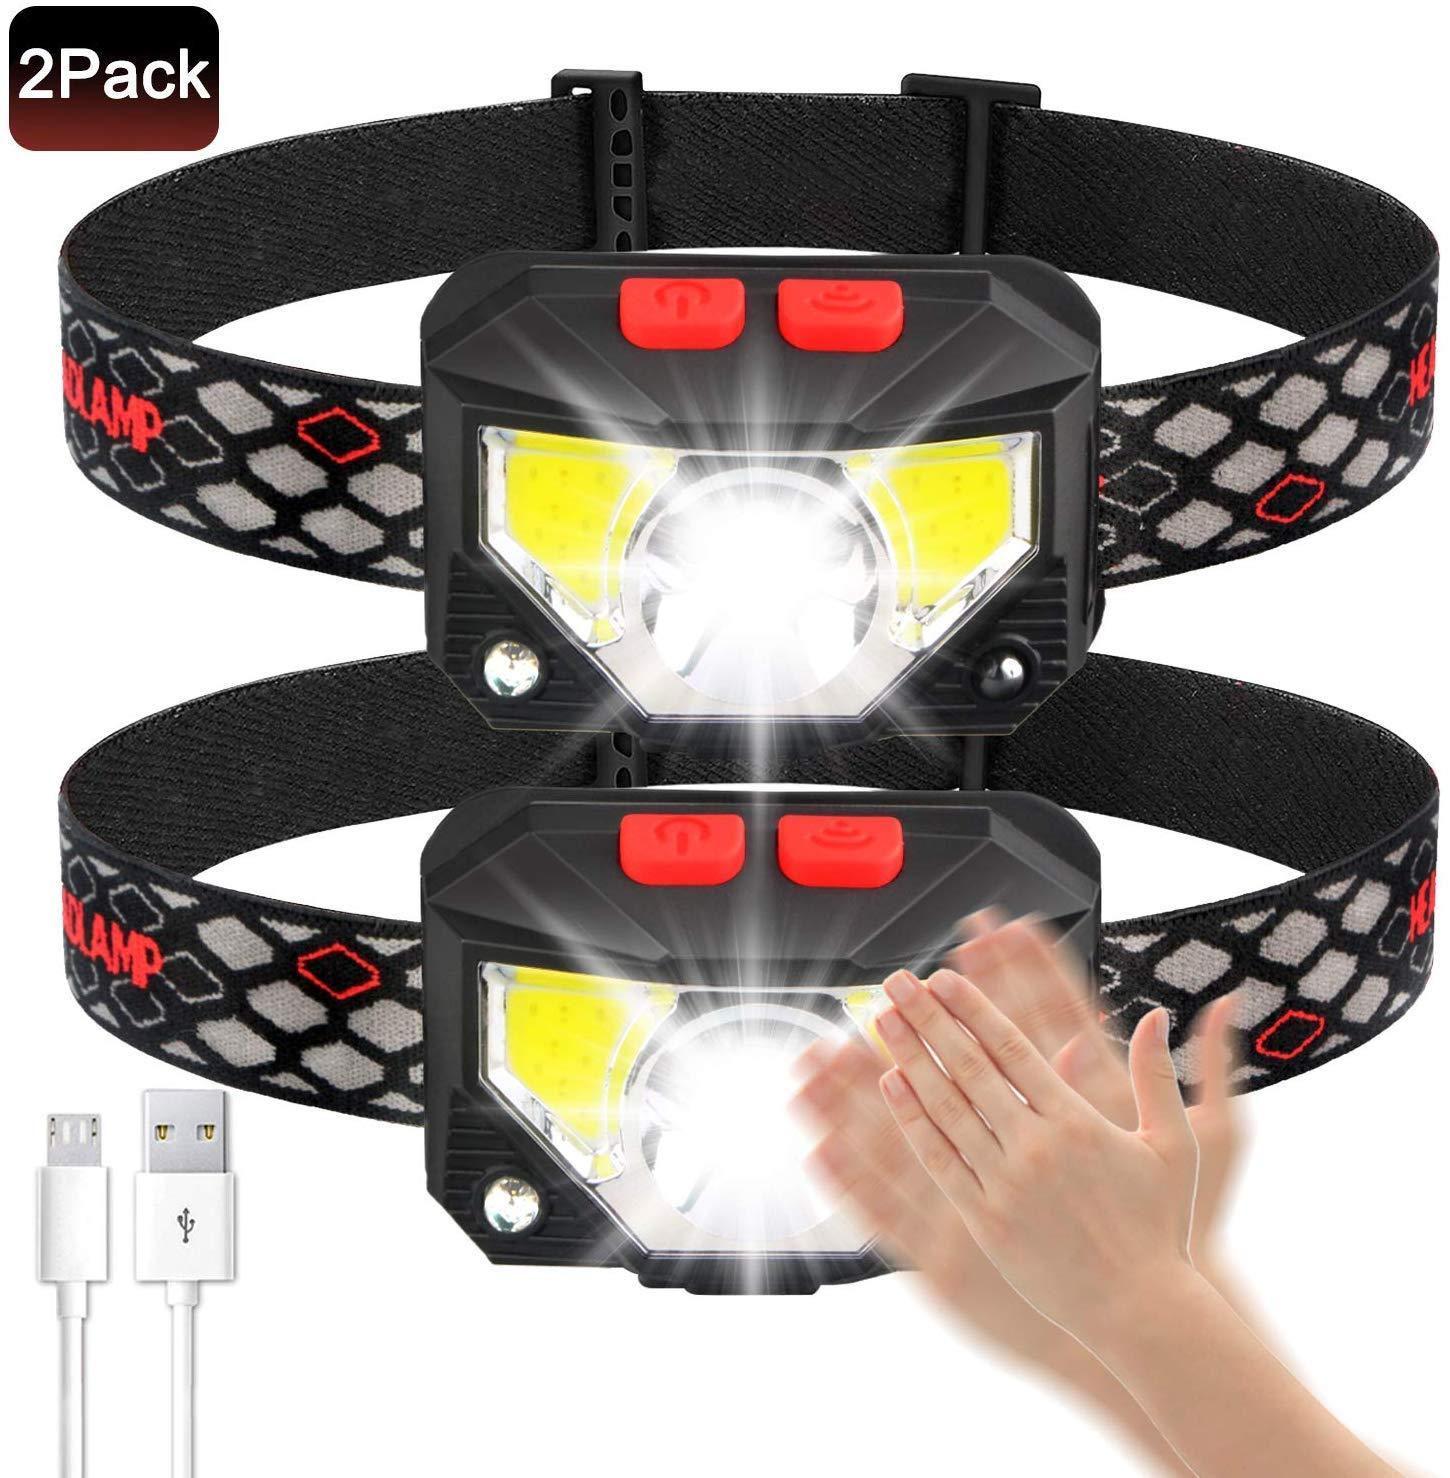 Faros Impermeables con Sensor de Movimiento para Exteriores hogar Linterna Recargable USB Ultra Brillante de 800 l/úmenes MYYYYI Linterna Frontal